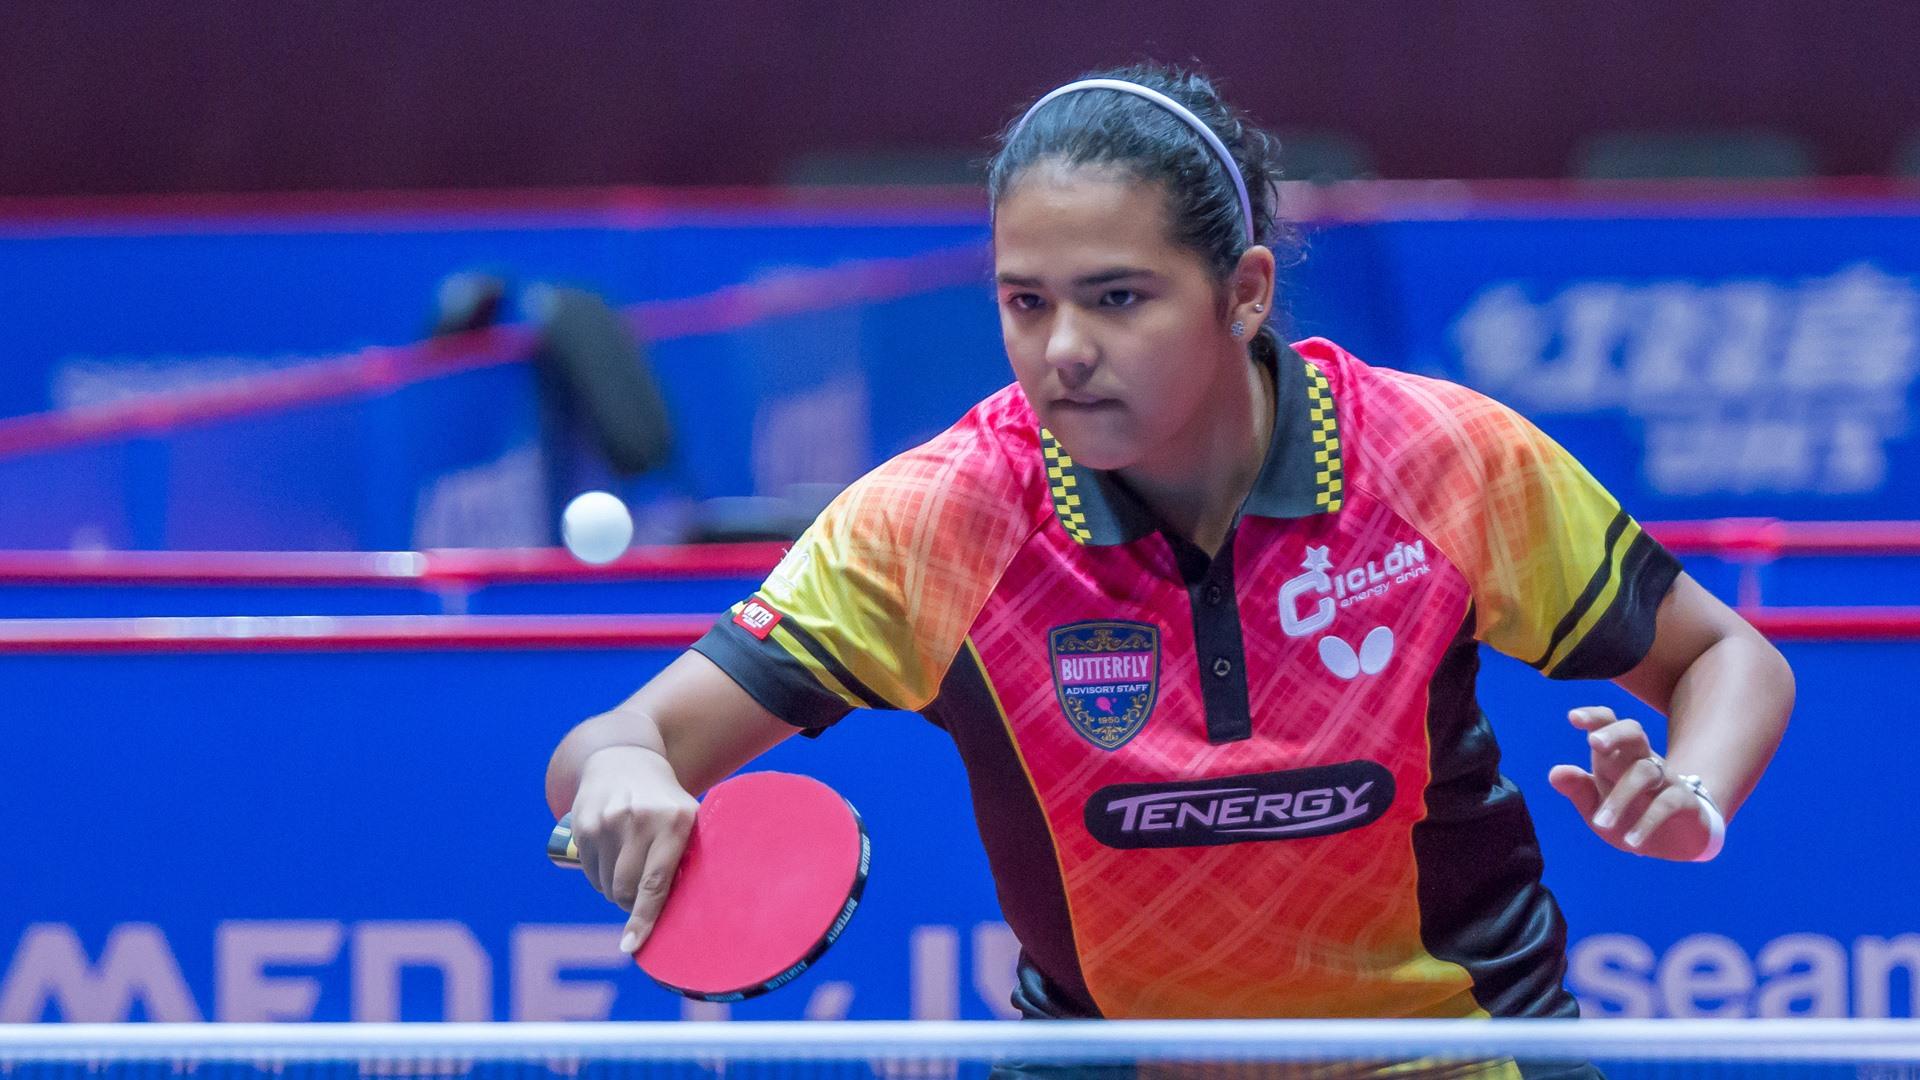 Under 21 title dream still alive for Adriana Diaz